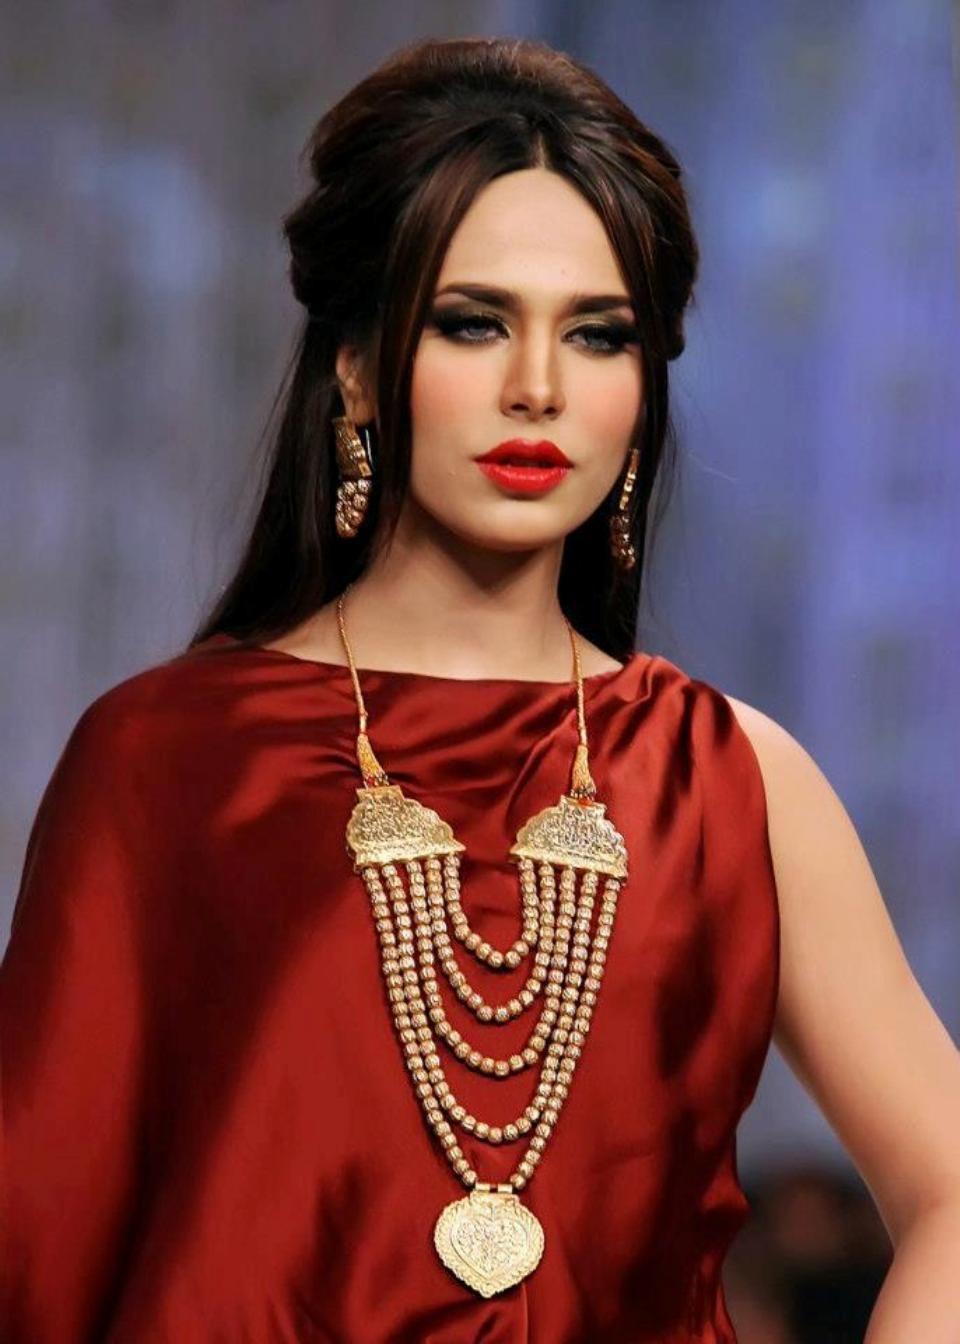 Ayyan ali bridal jeweller photo shoot design 2013 for women - Model Ayyan Ali Pinner Sandra Andrade S